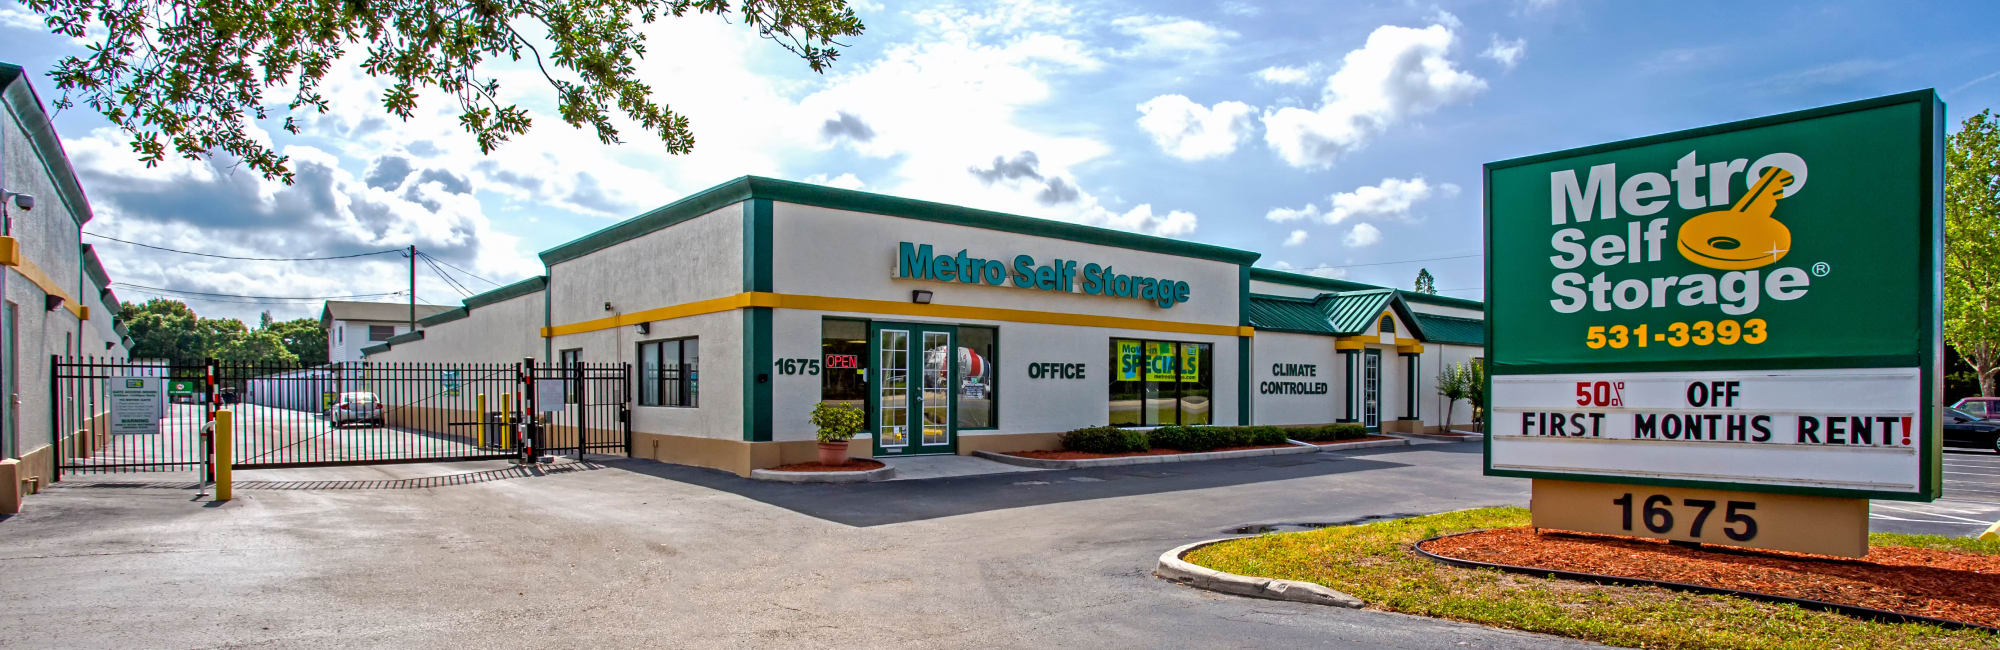 Good Metro Self Storage In Largo, FL